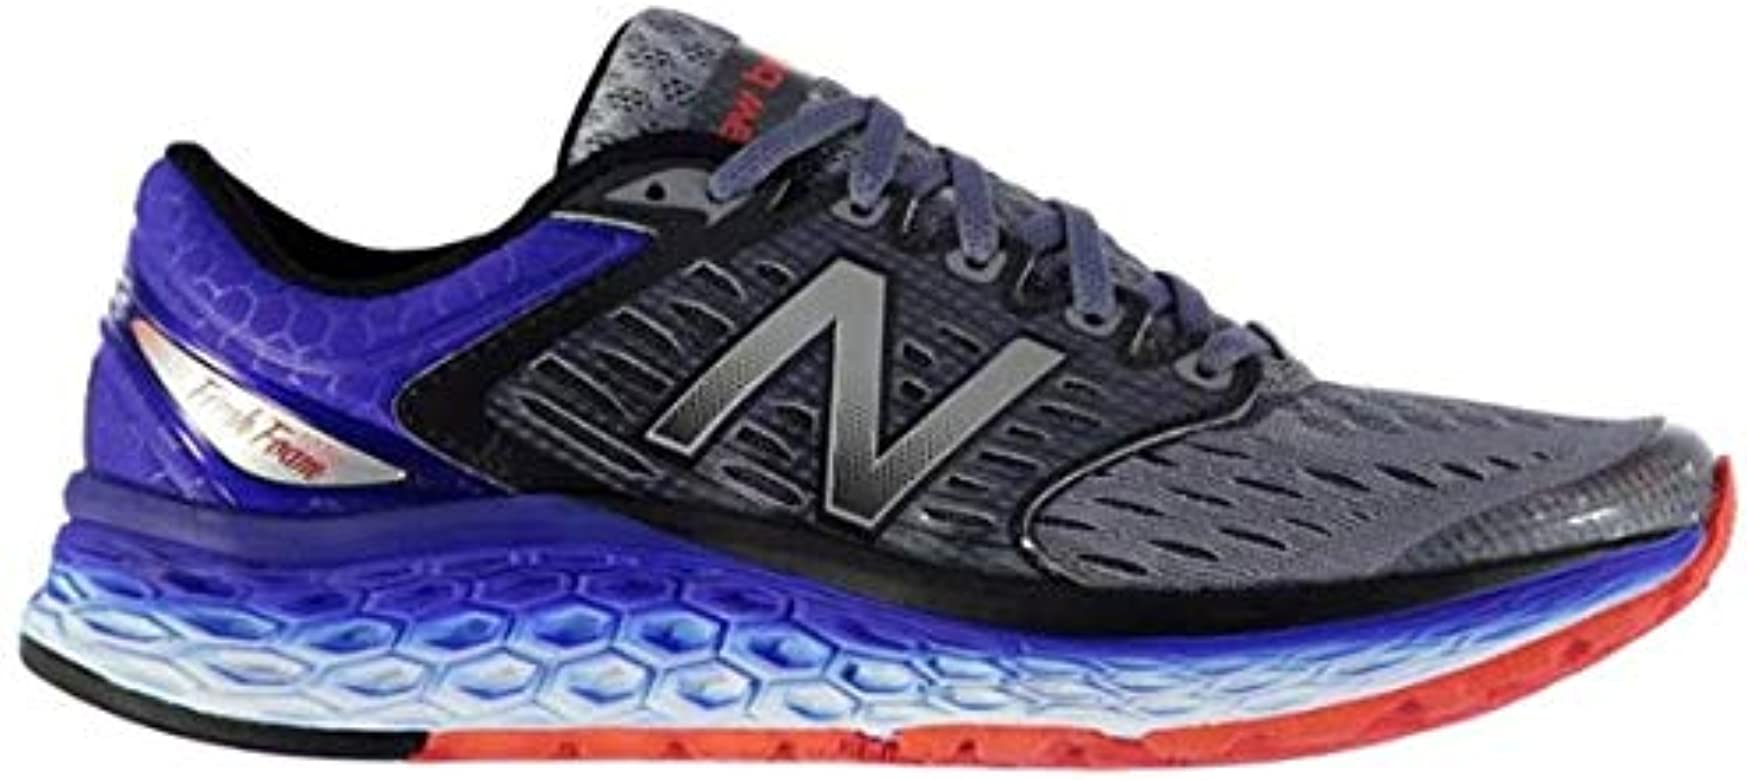 New Balance M1080v6 Zapatillas Para Correr (4E Width) - AW16 - 49: Amazon.es: Zapatos y complementos